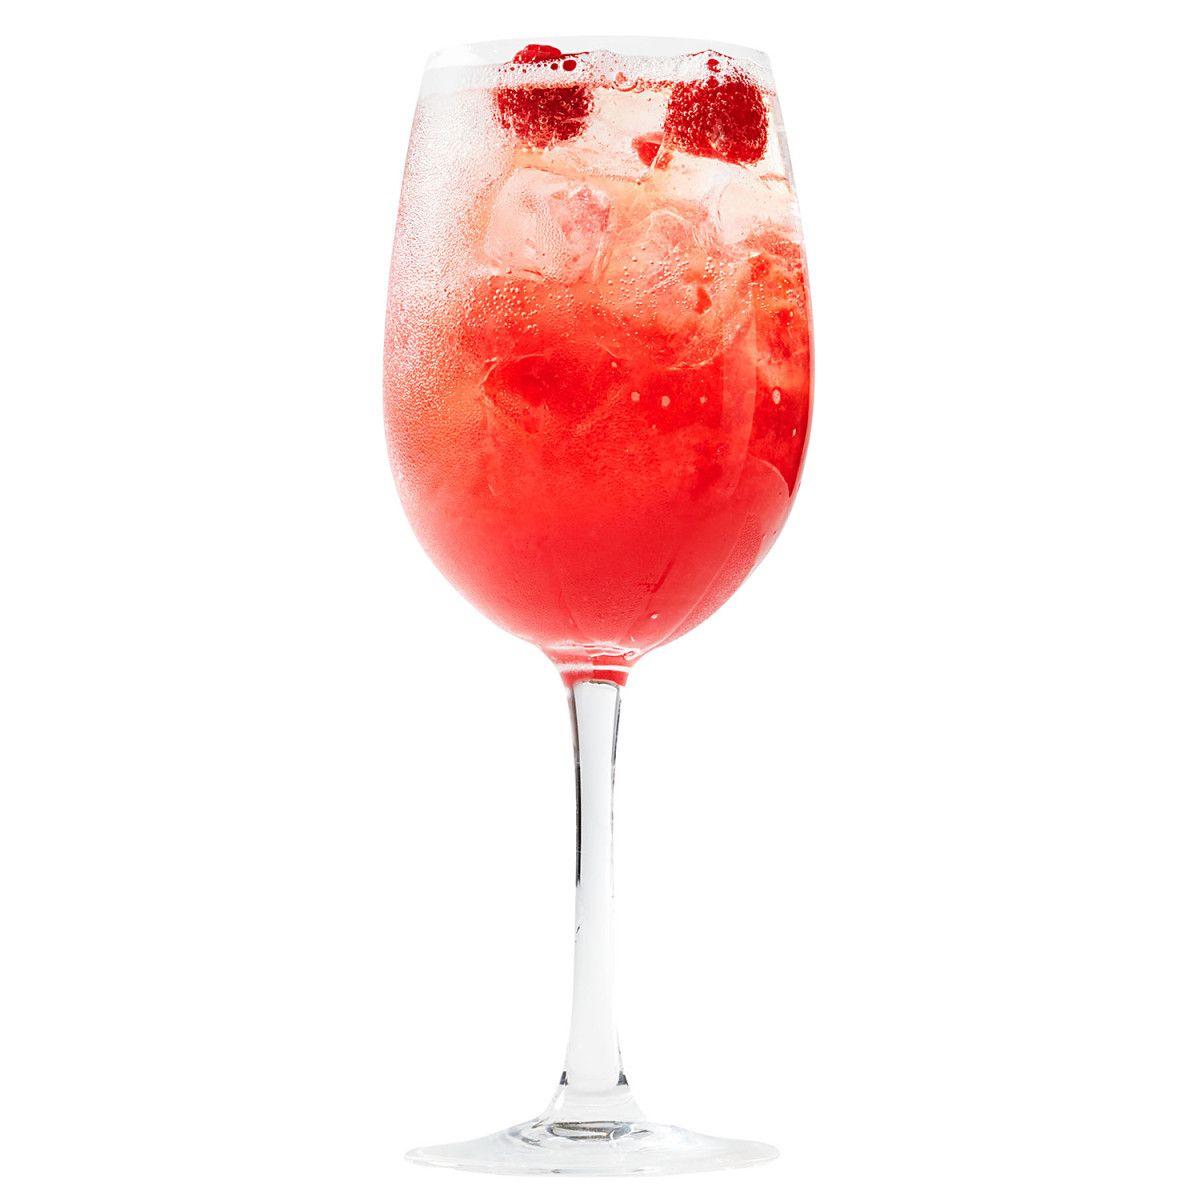 John S Cocktail Rubino Recipe Popular Mixed Drinks Cocktails Cocktail Recipes